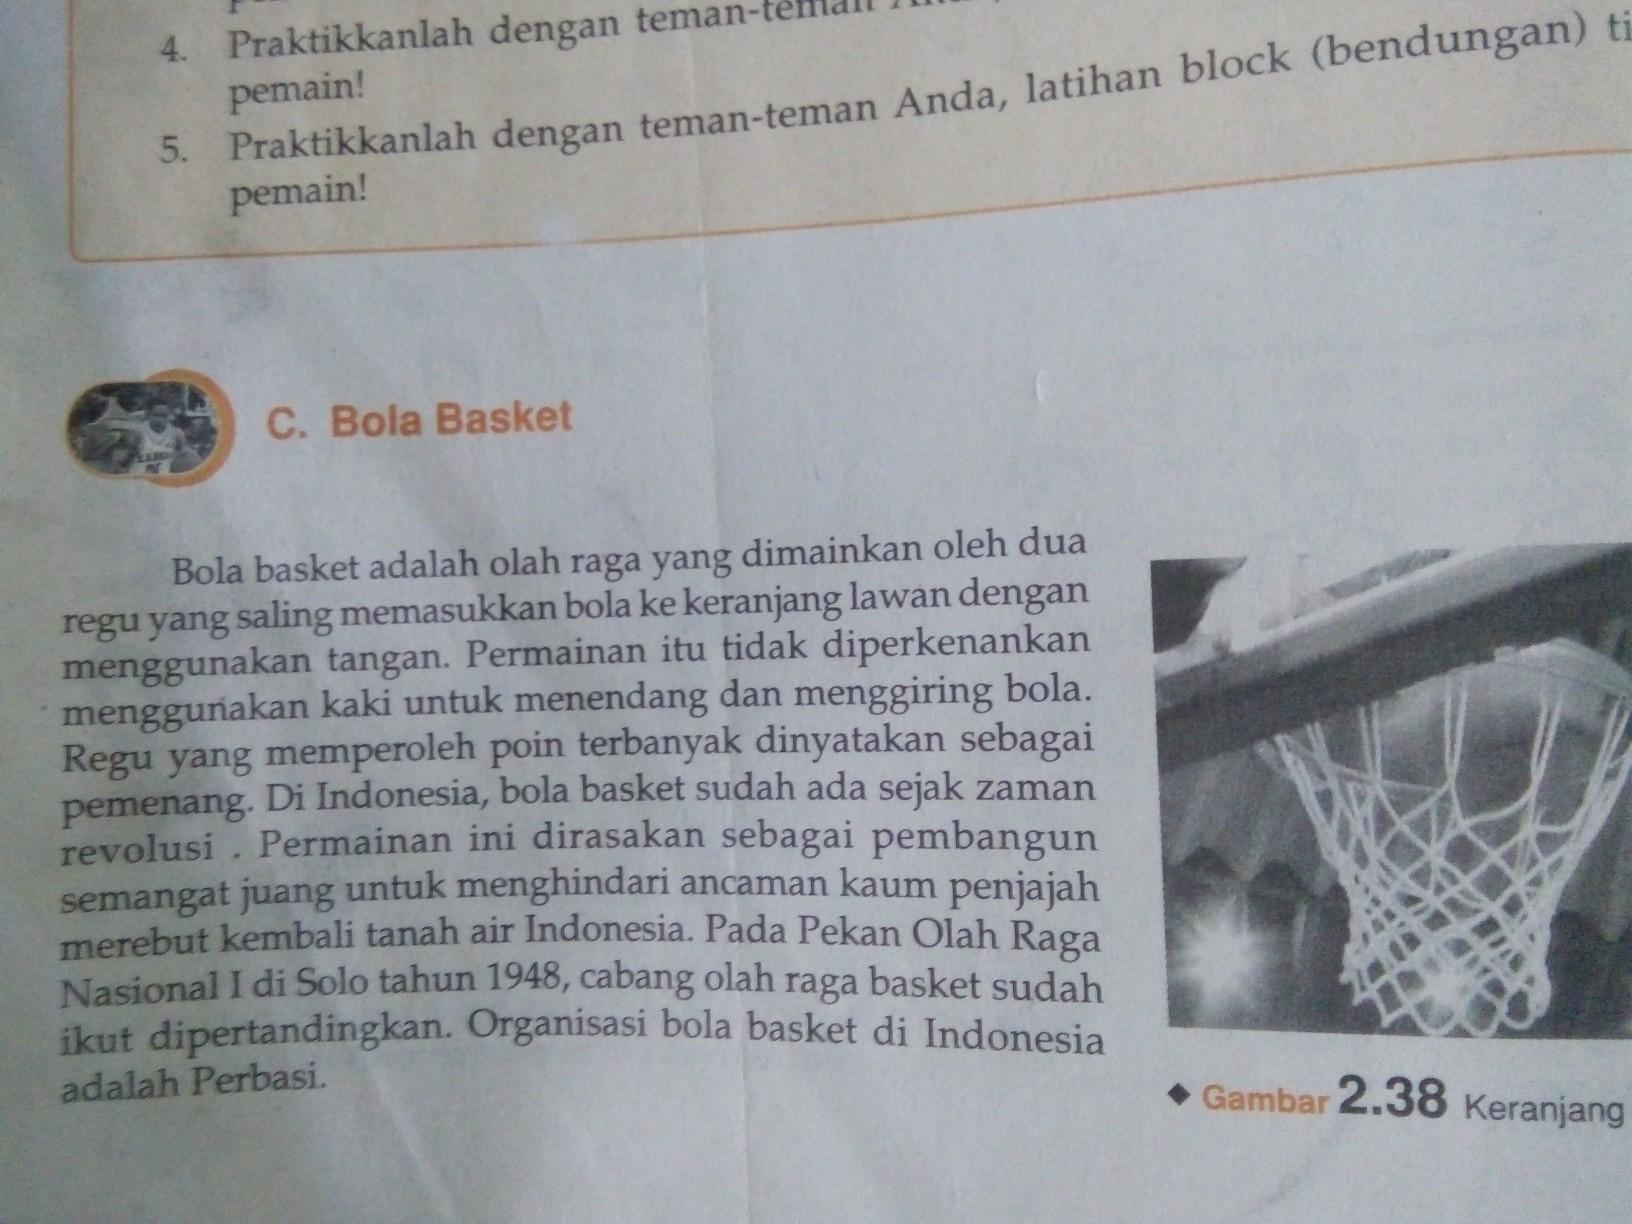 Sejarah Permainan Bola Basket Brainly Co Id